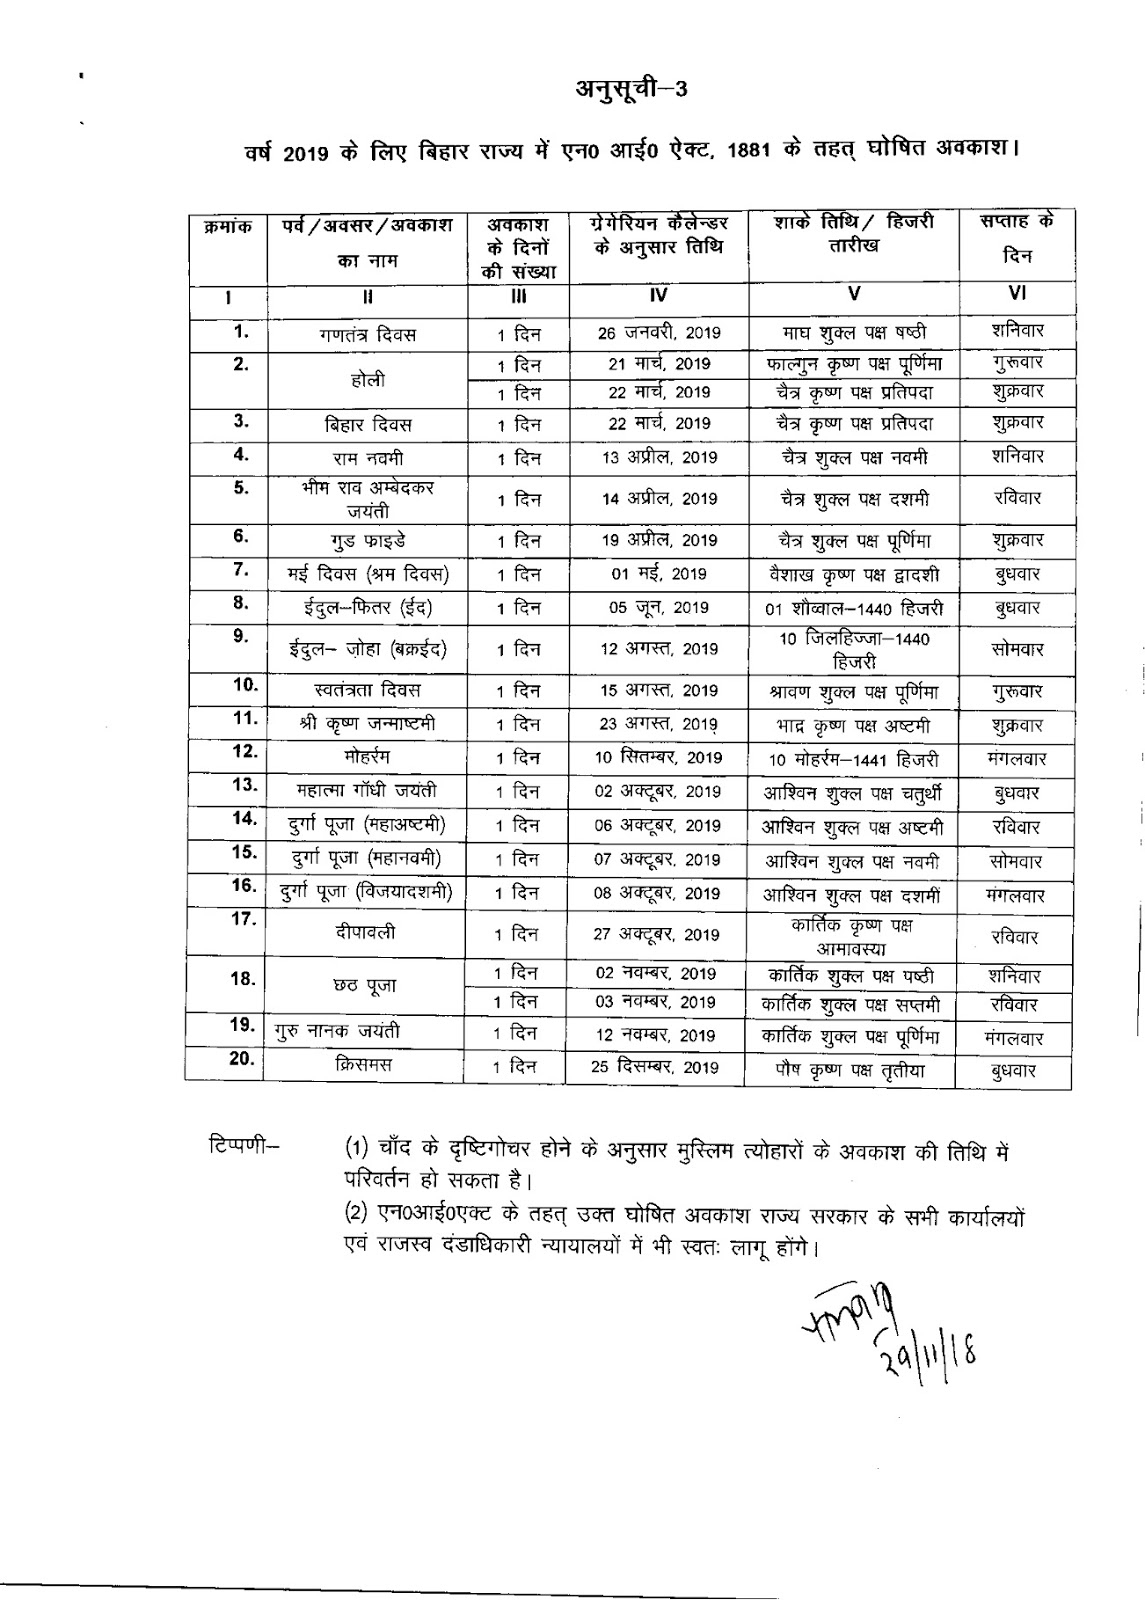 Bihar Government Calendar 2019 #educratsweb for Government Calendar 2020 Bihar